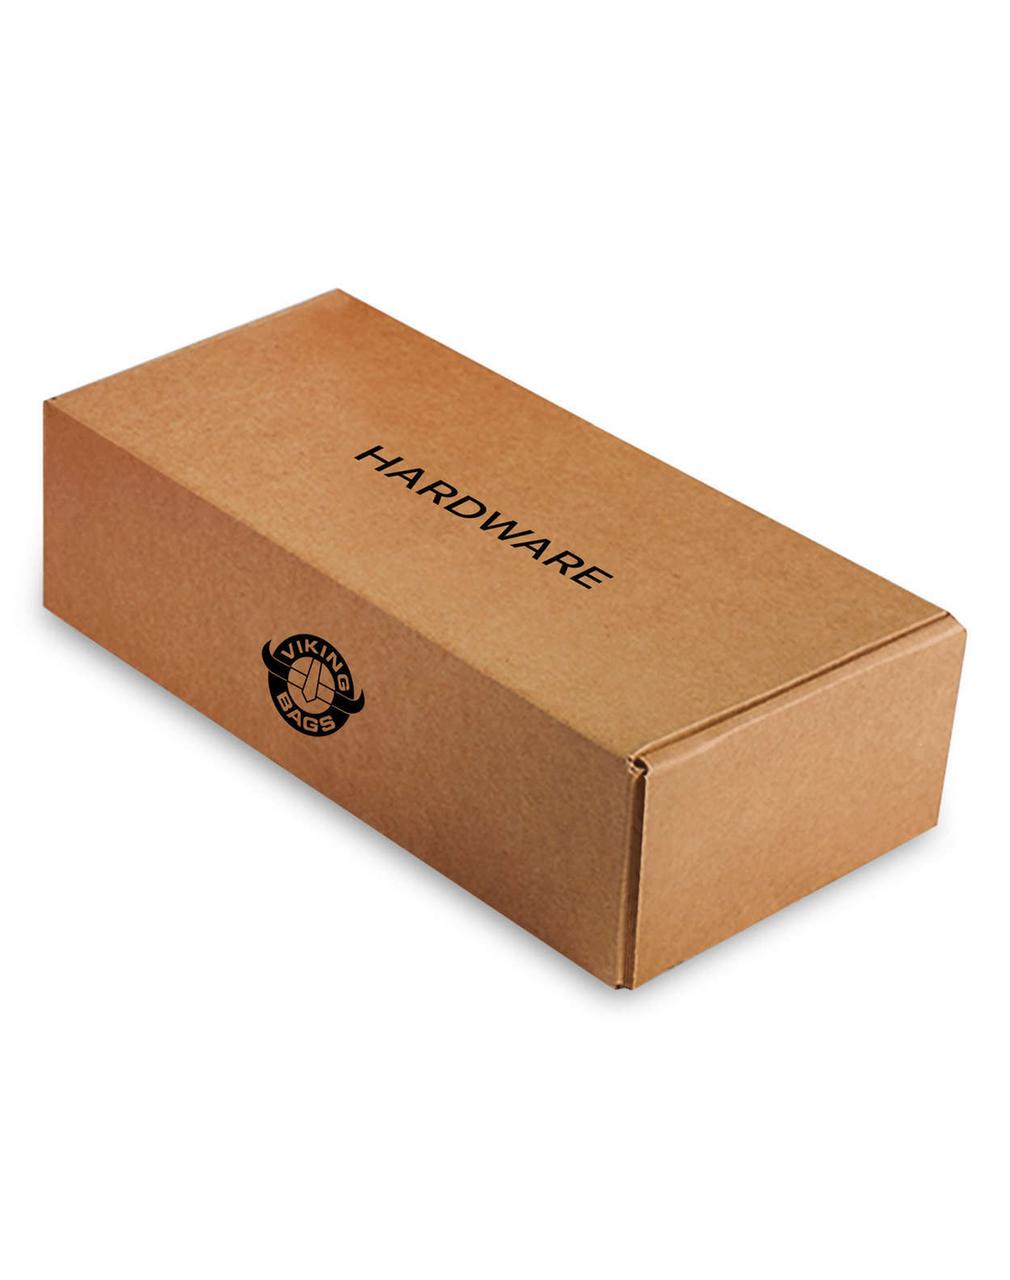 Honda VTX 1300 C Medium Slanted Motorcycle Saddlebags Hardware Box